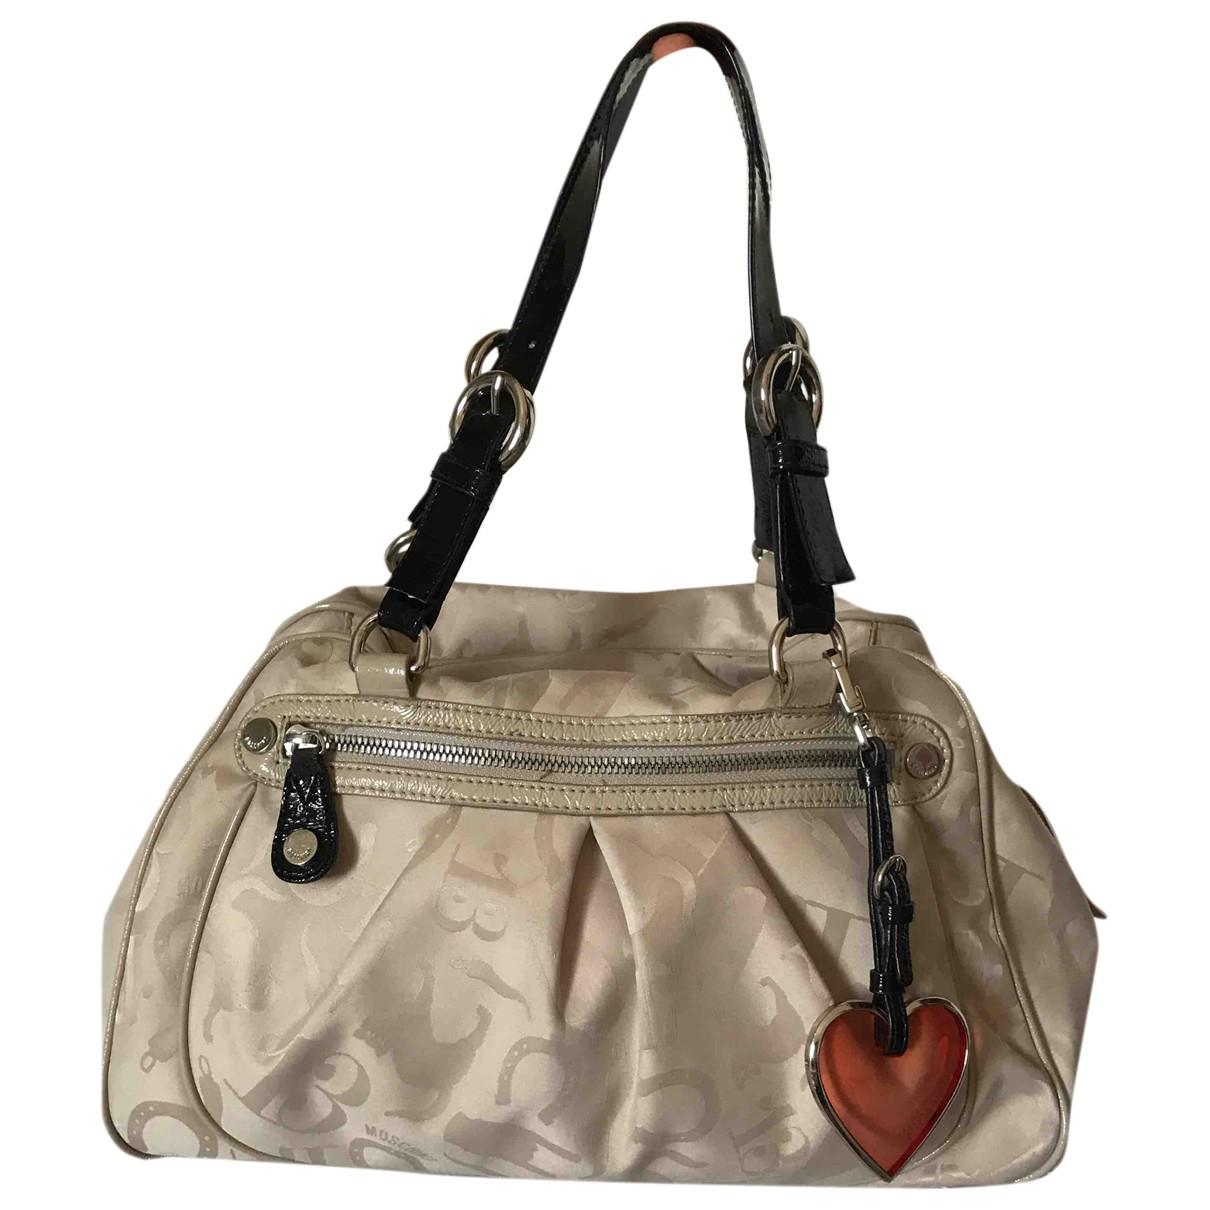 Moschino \N Beige handbag for Women \N